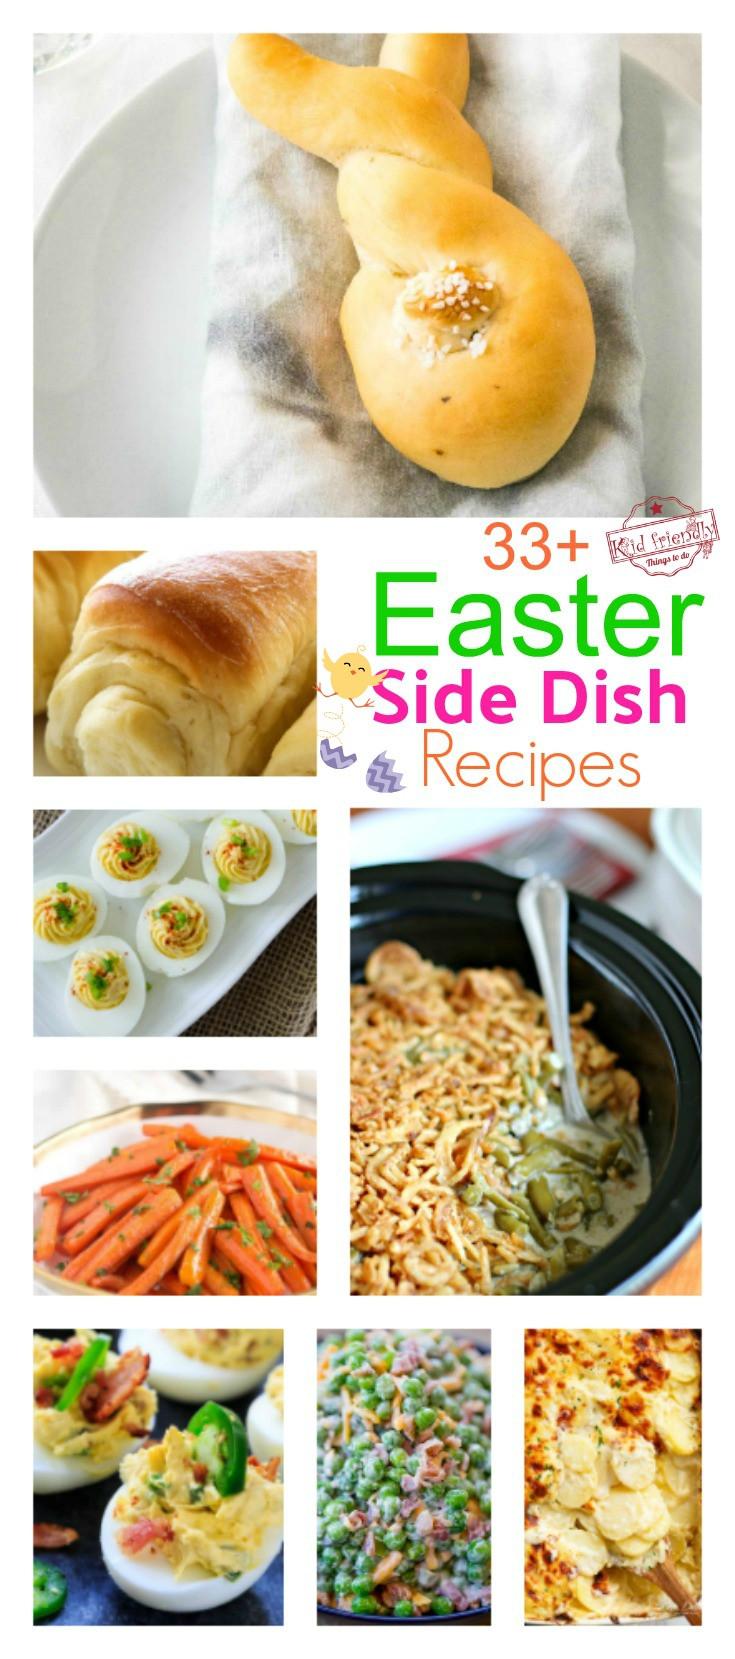 Sides For Easter Dinner  Over 33 Easter Side Dish Recipes for Your Celebration Dinner